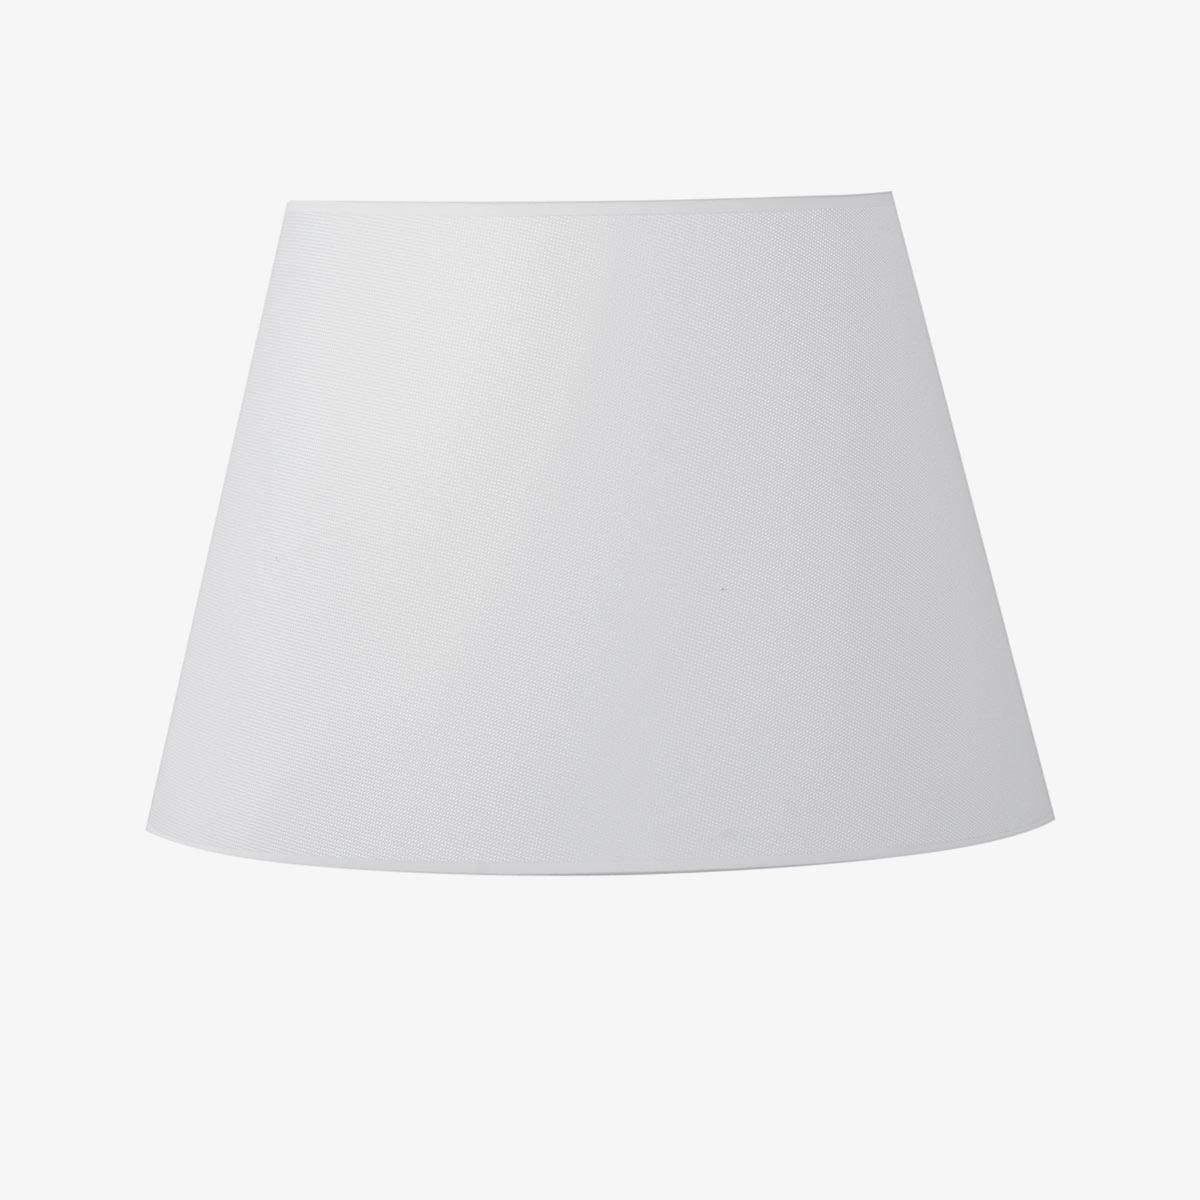 Pantalla Dream tejido poliester blanco   Diámetro 45 cm